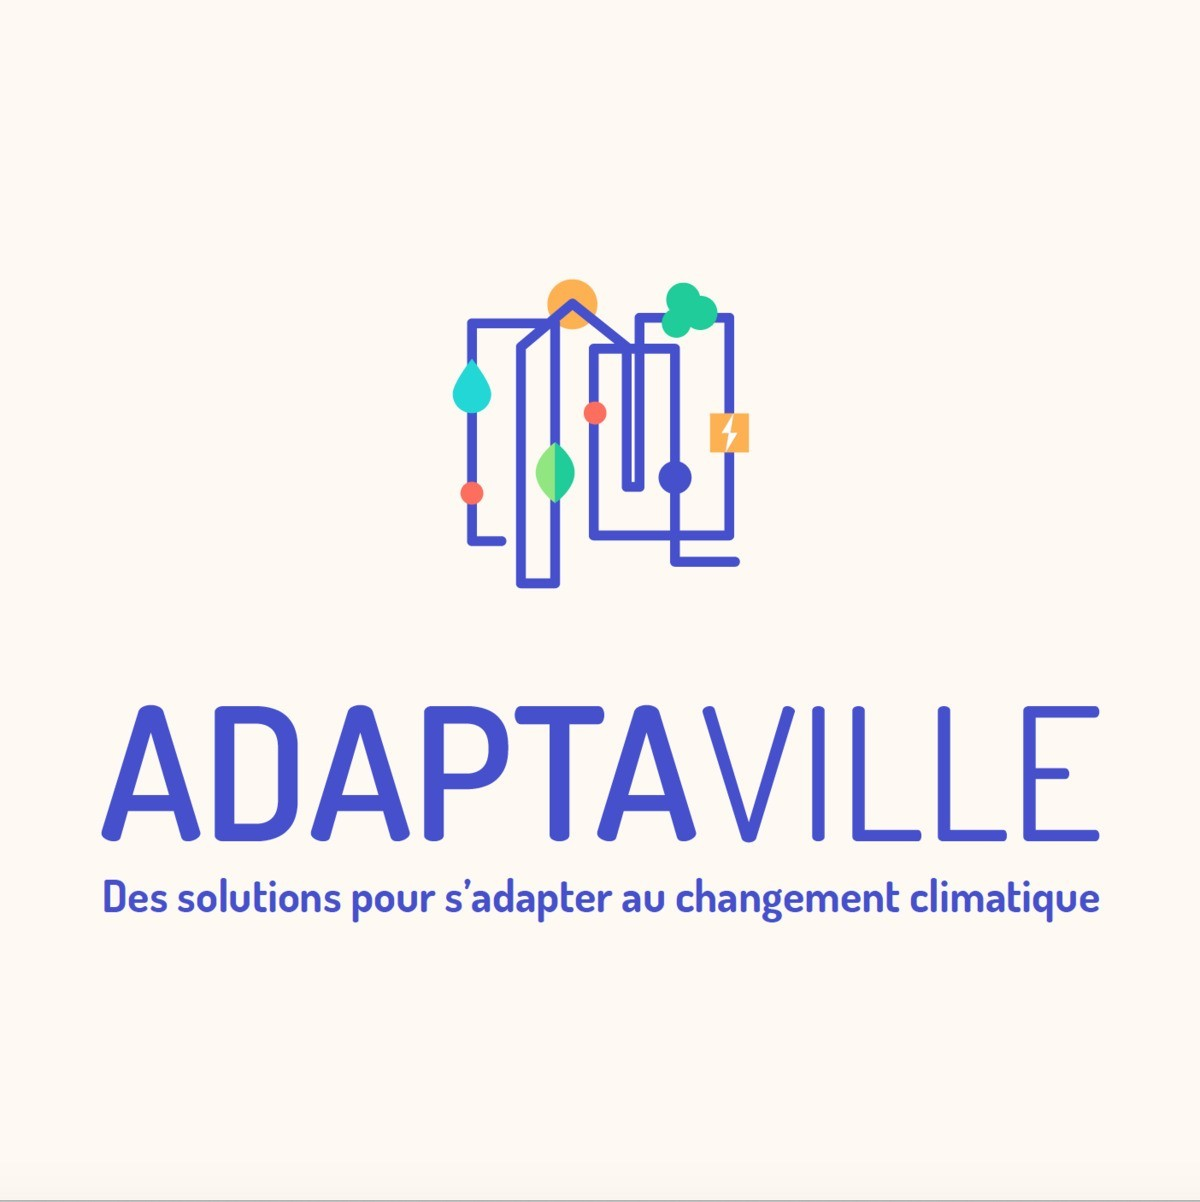 [Webinar] Lancement de la plateforme AdaptaVille